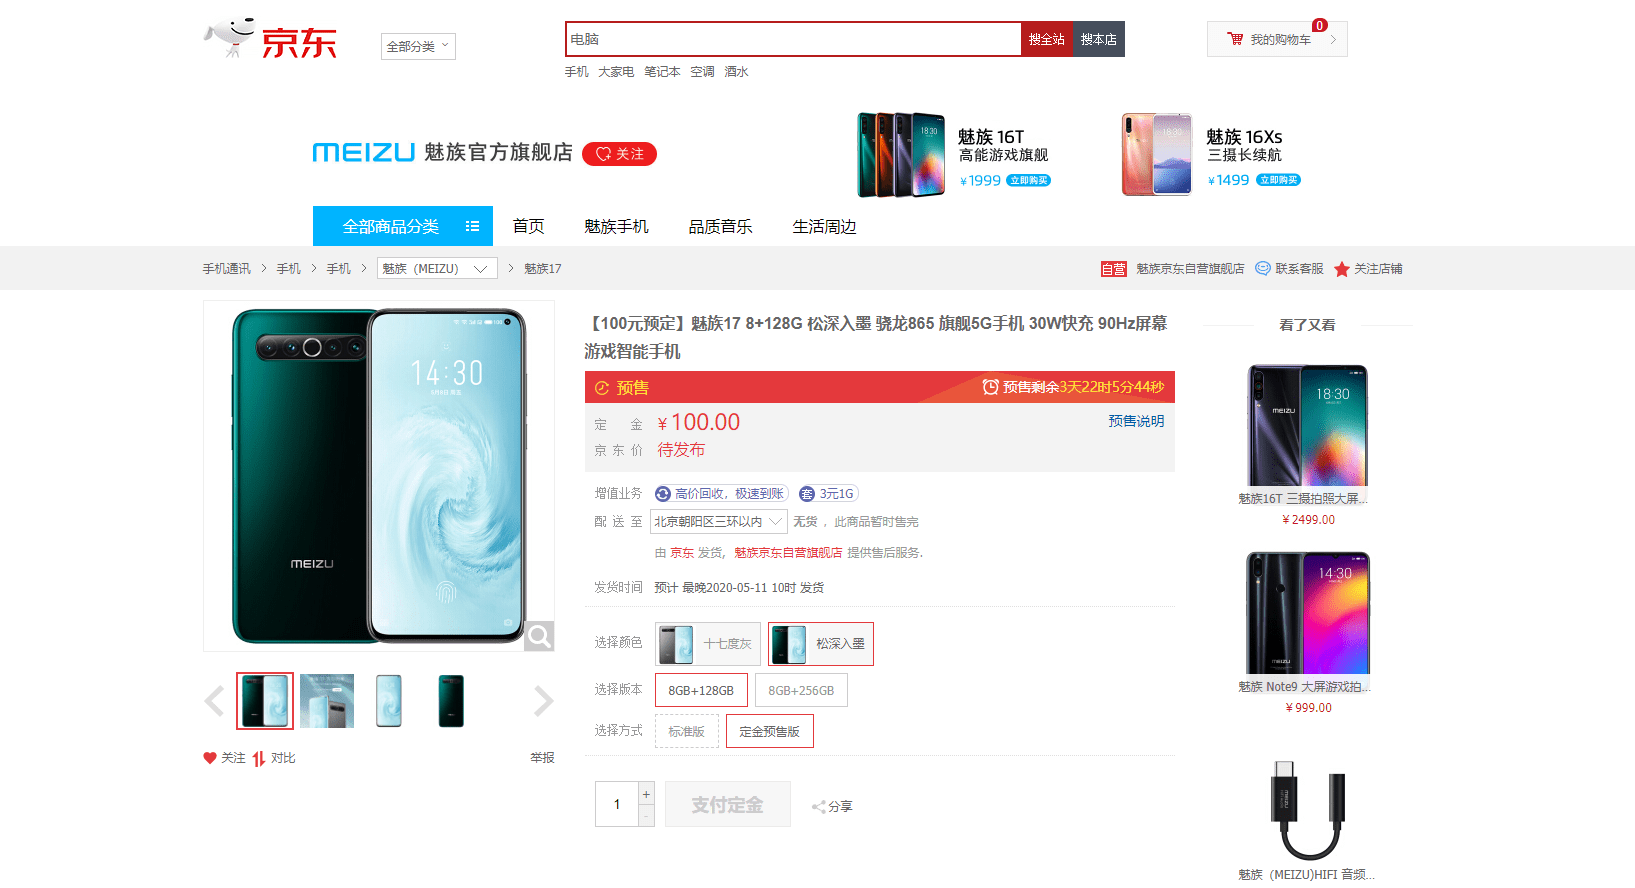 M081QはMeizu 17、M091QはMeizu 17 Proとして発表、京東の予約ページから明らかに